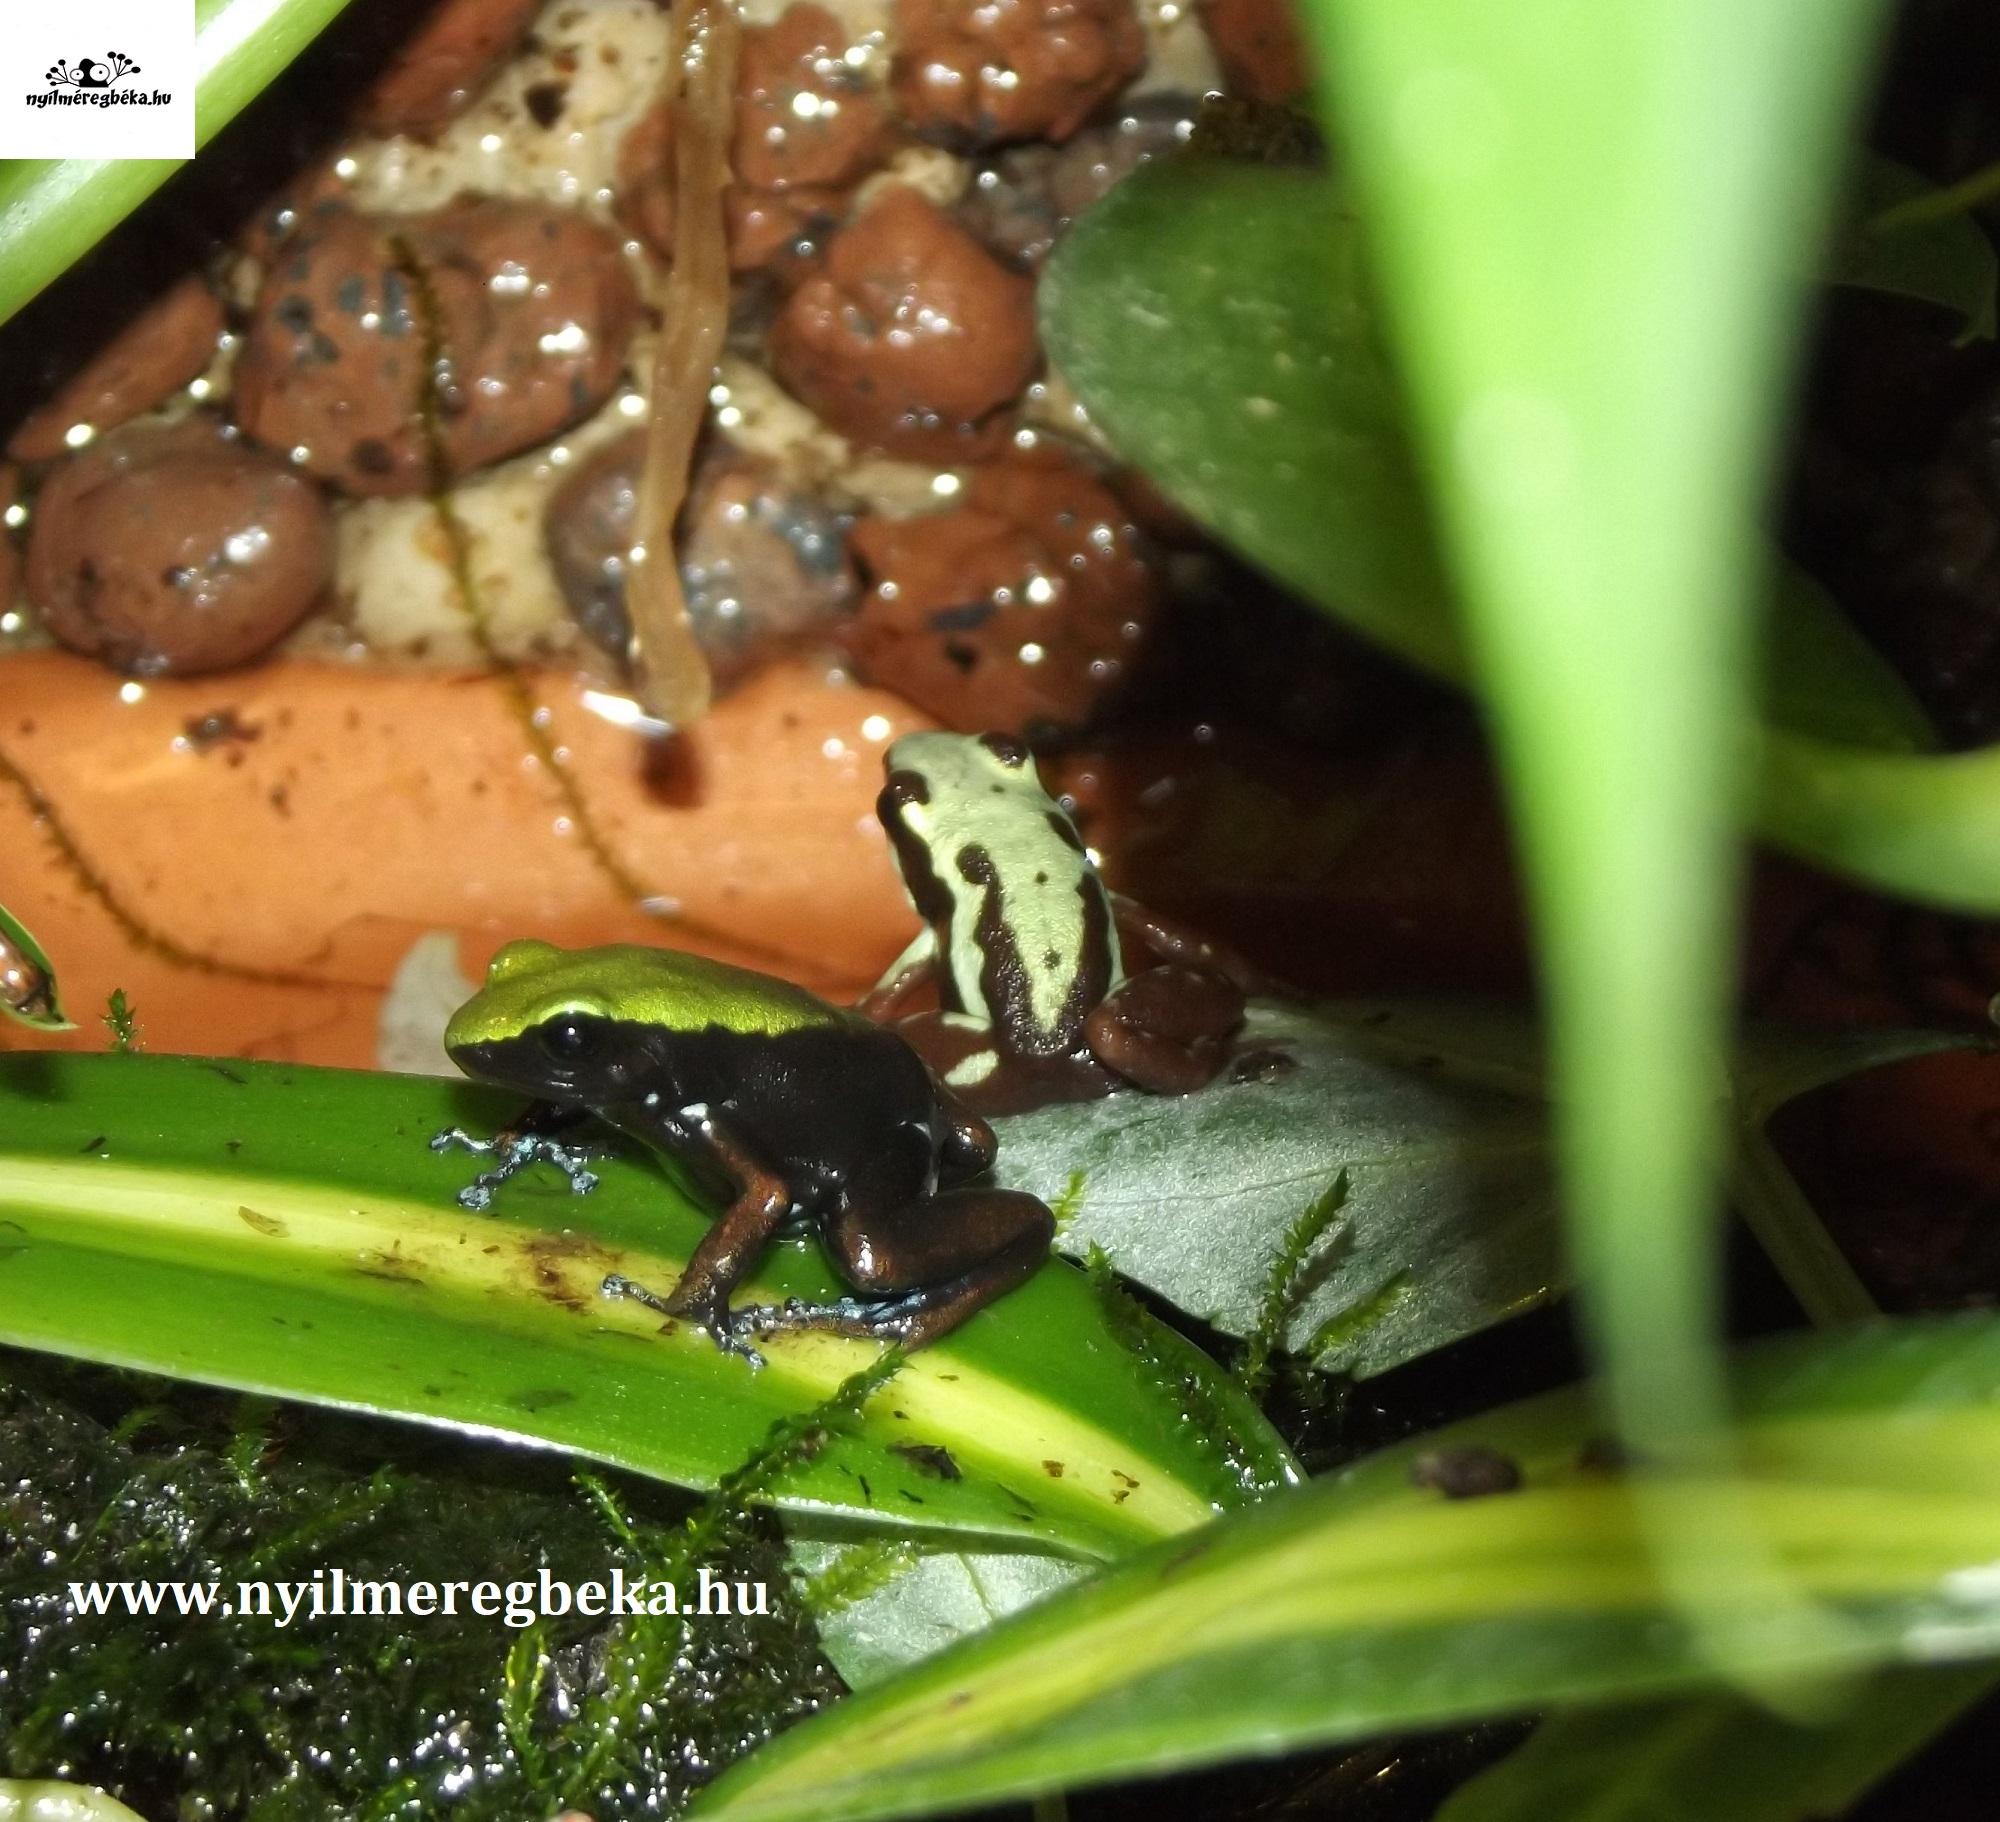 Epipedobates tricolor, Mantella laevigata